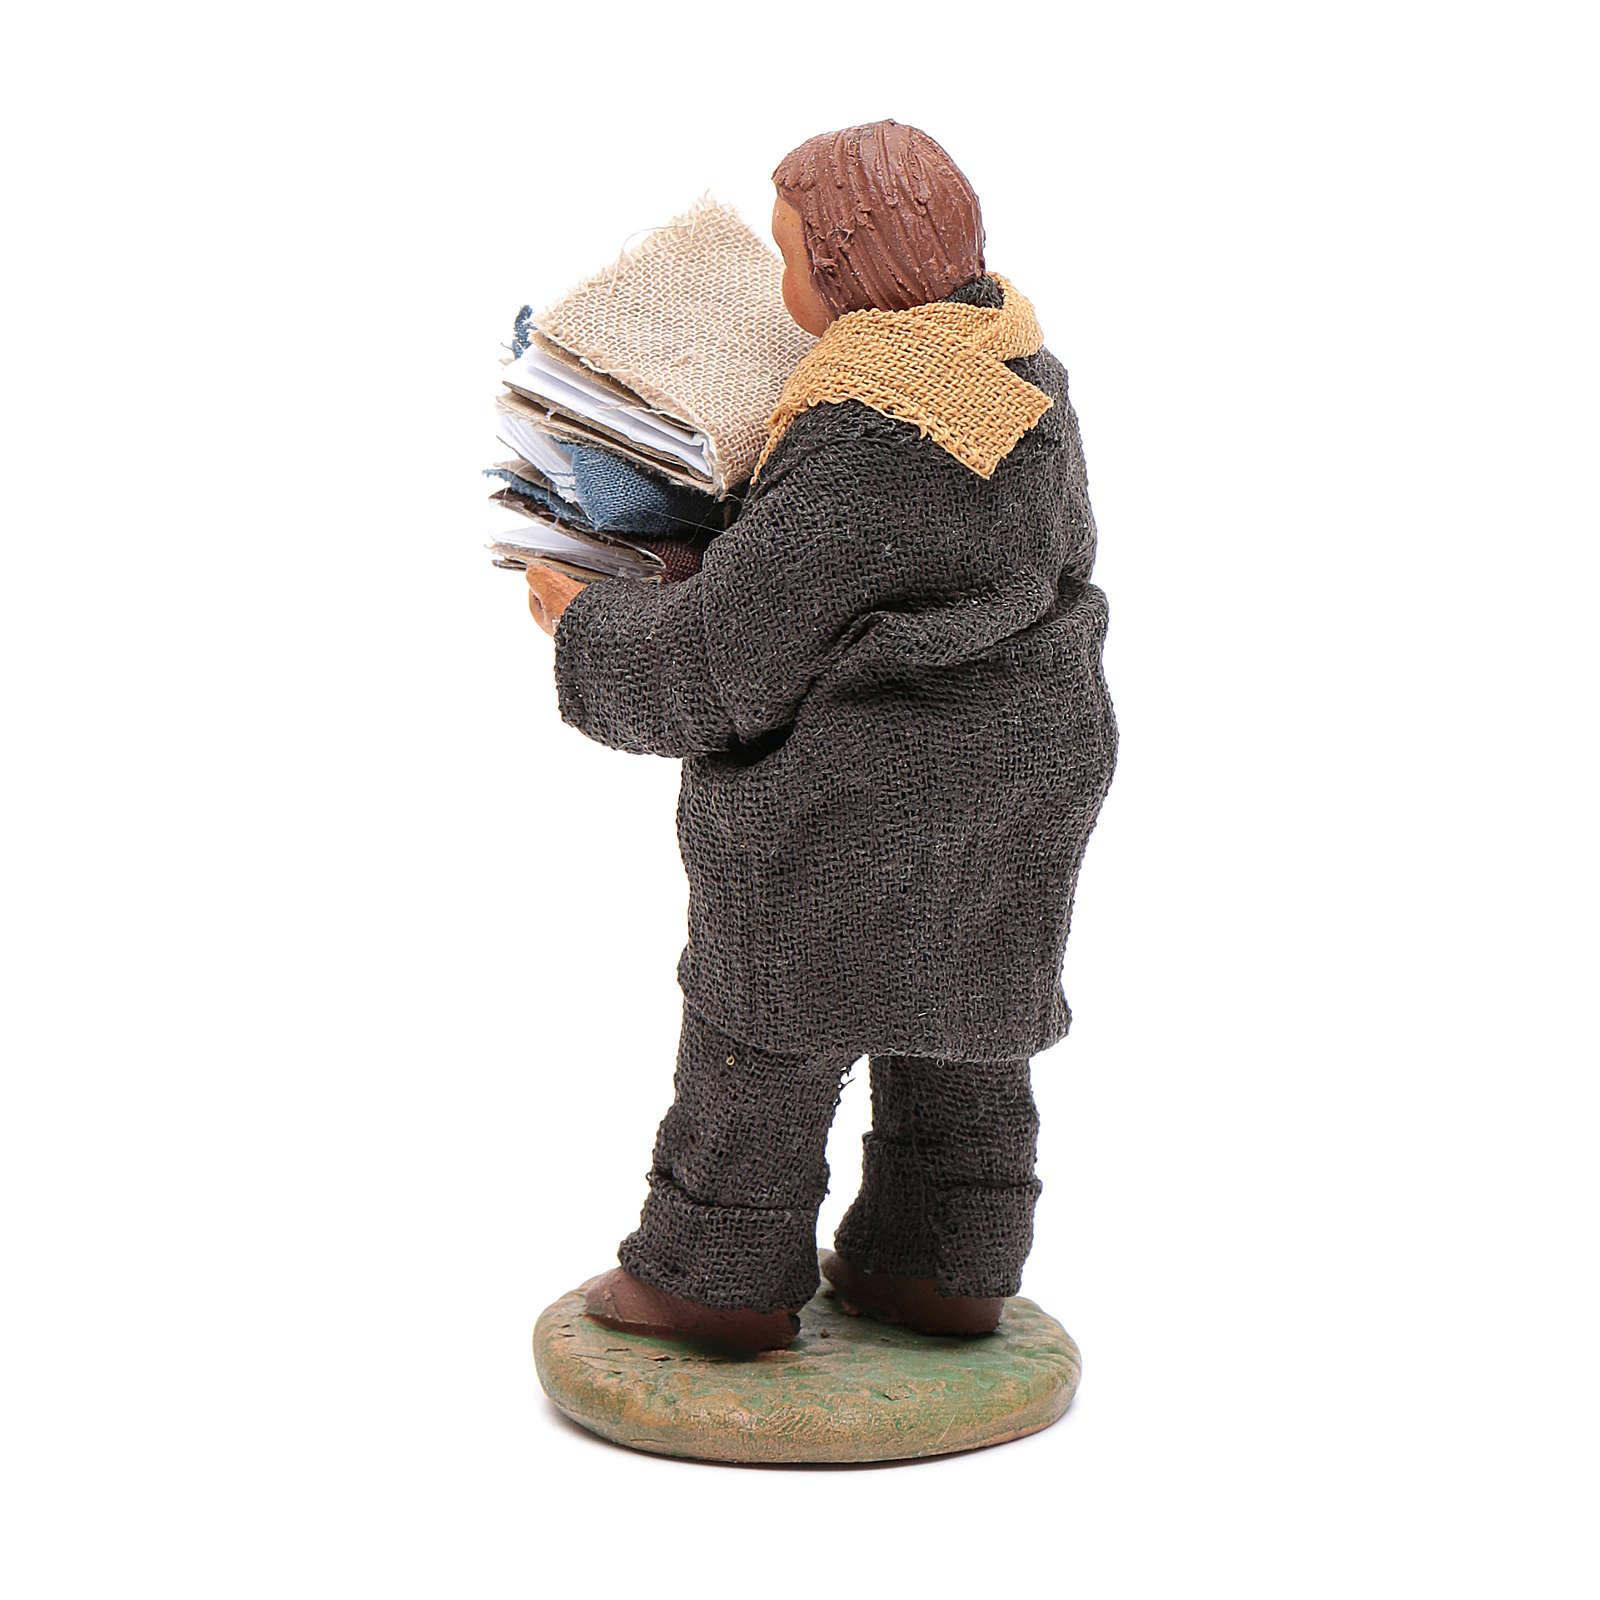 Man carryin books 10cm, Neapolitan Nativity figurine 4